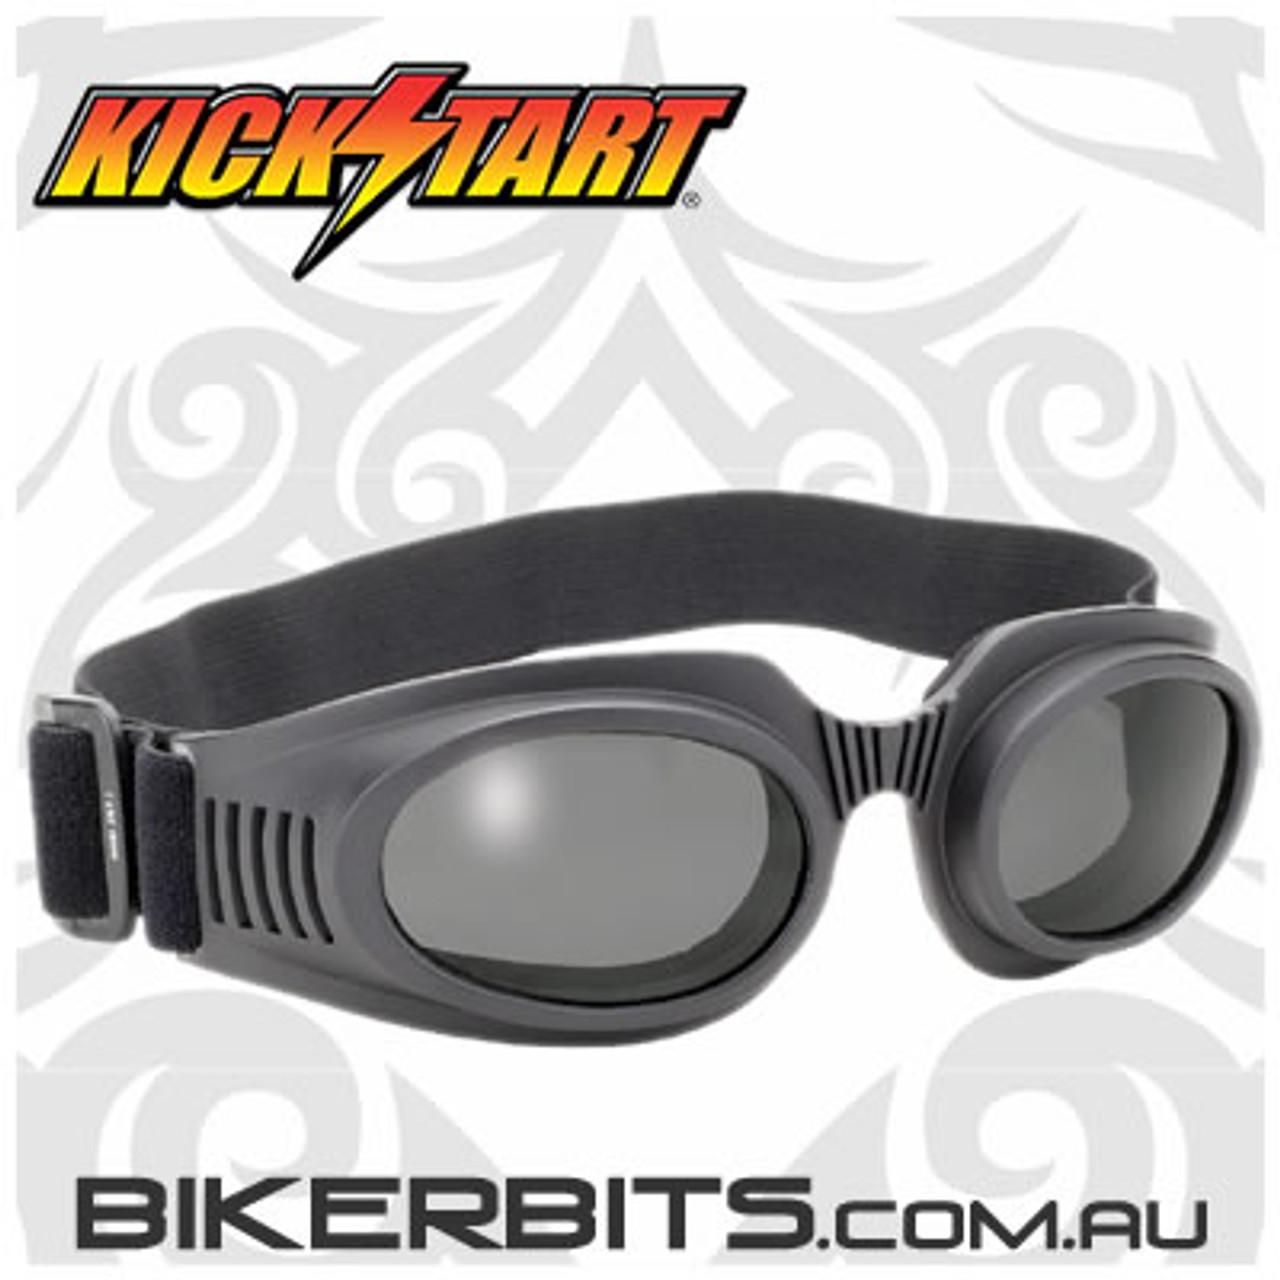 Motorcycle Goggles - Kickstart Thunder Cat - Smoke/Black